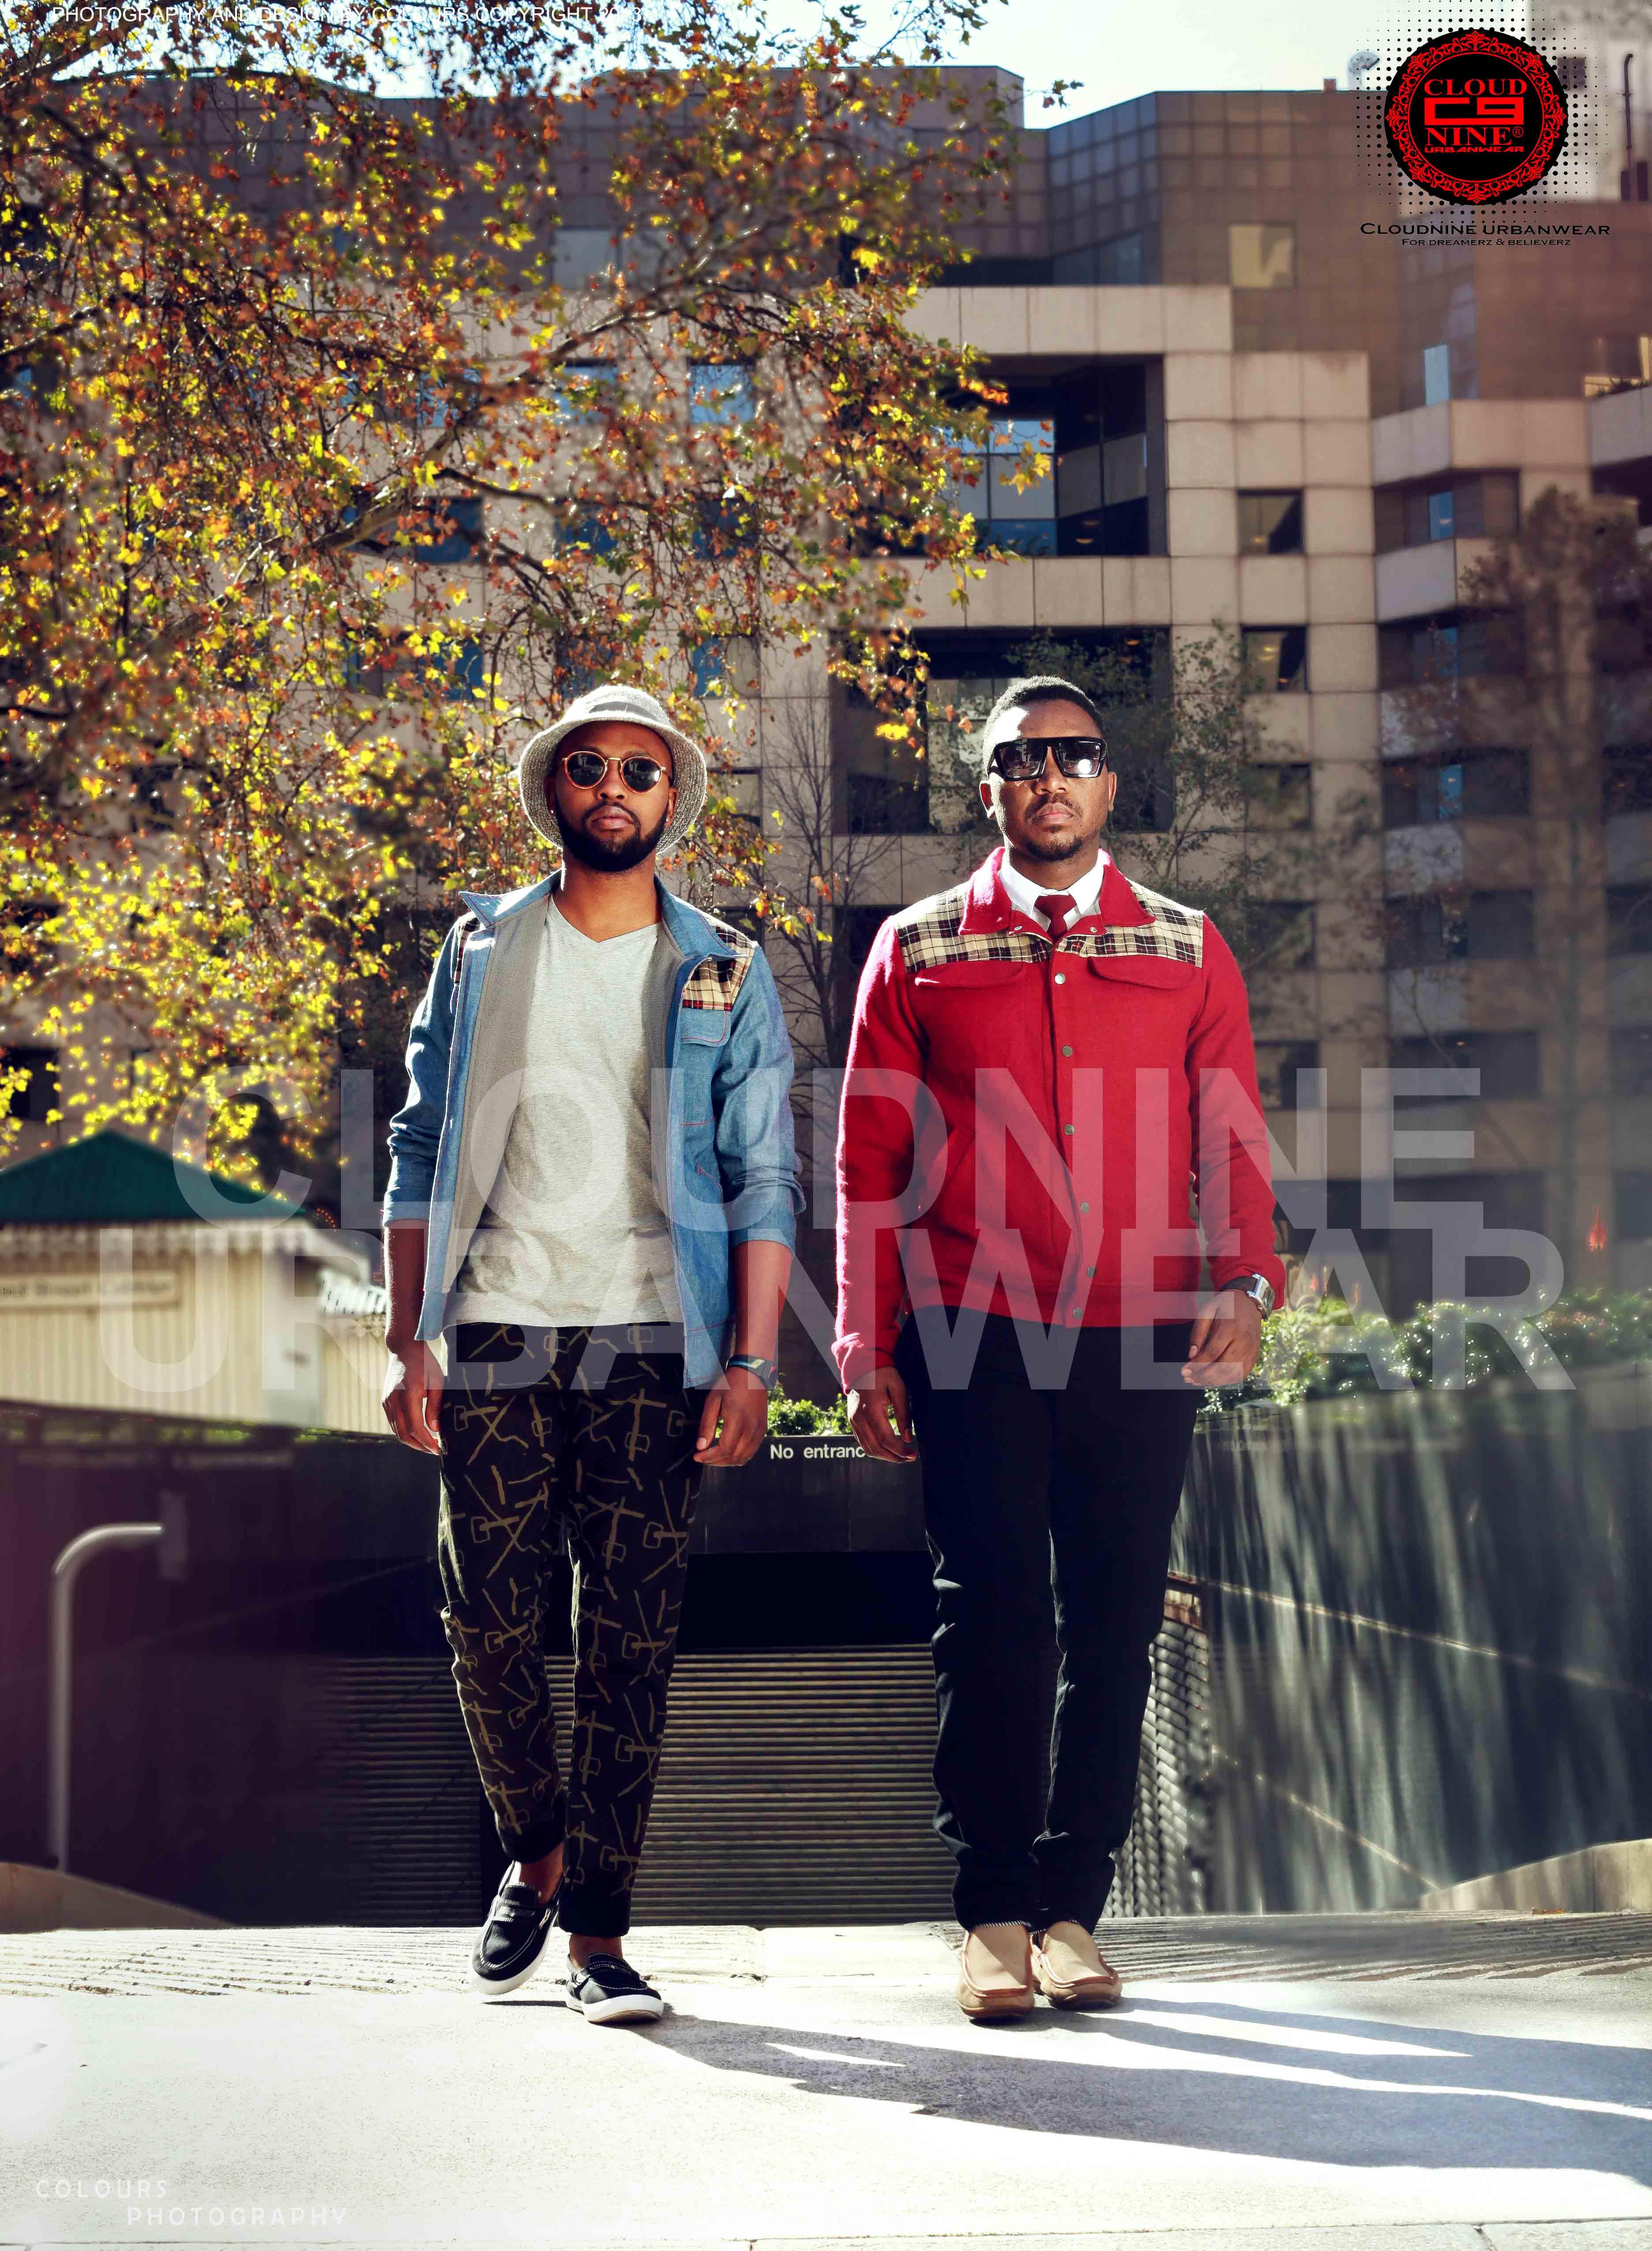 6990e9c8559f Cloudnine Urbanwear WINTER Denim and Maroon Jackets......Coming soon